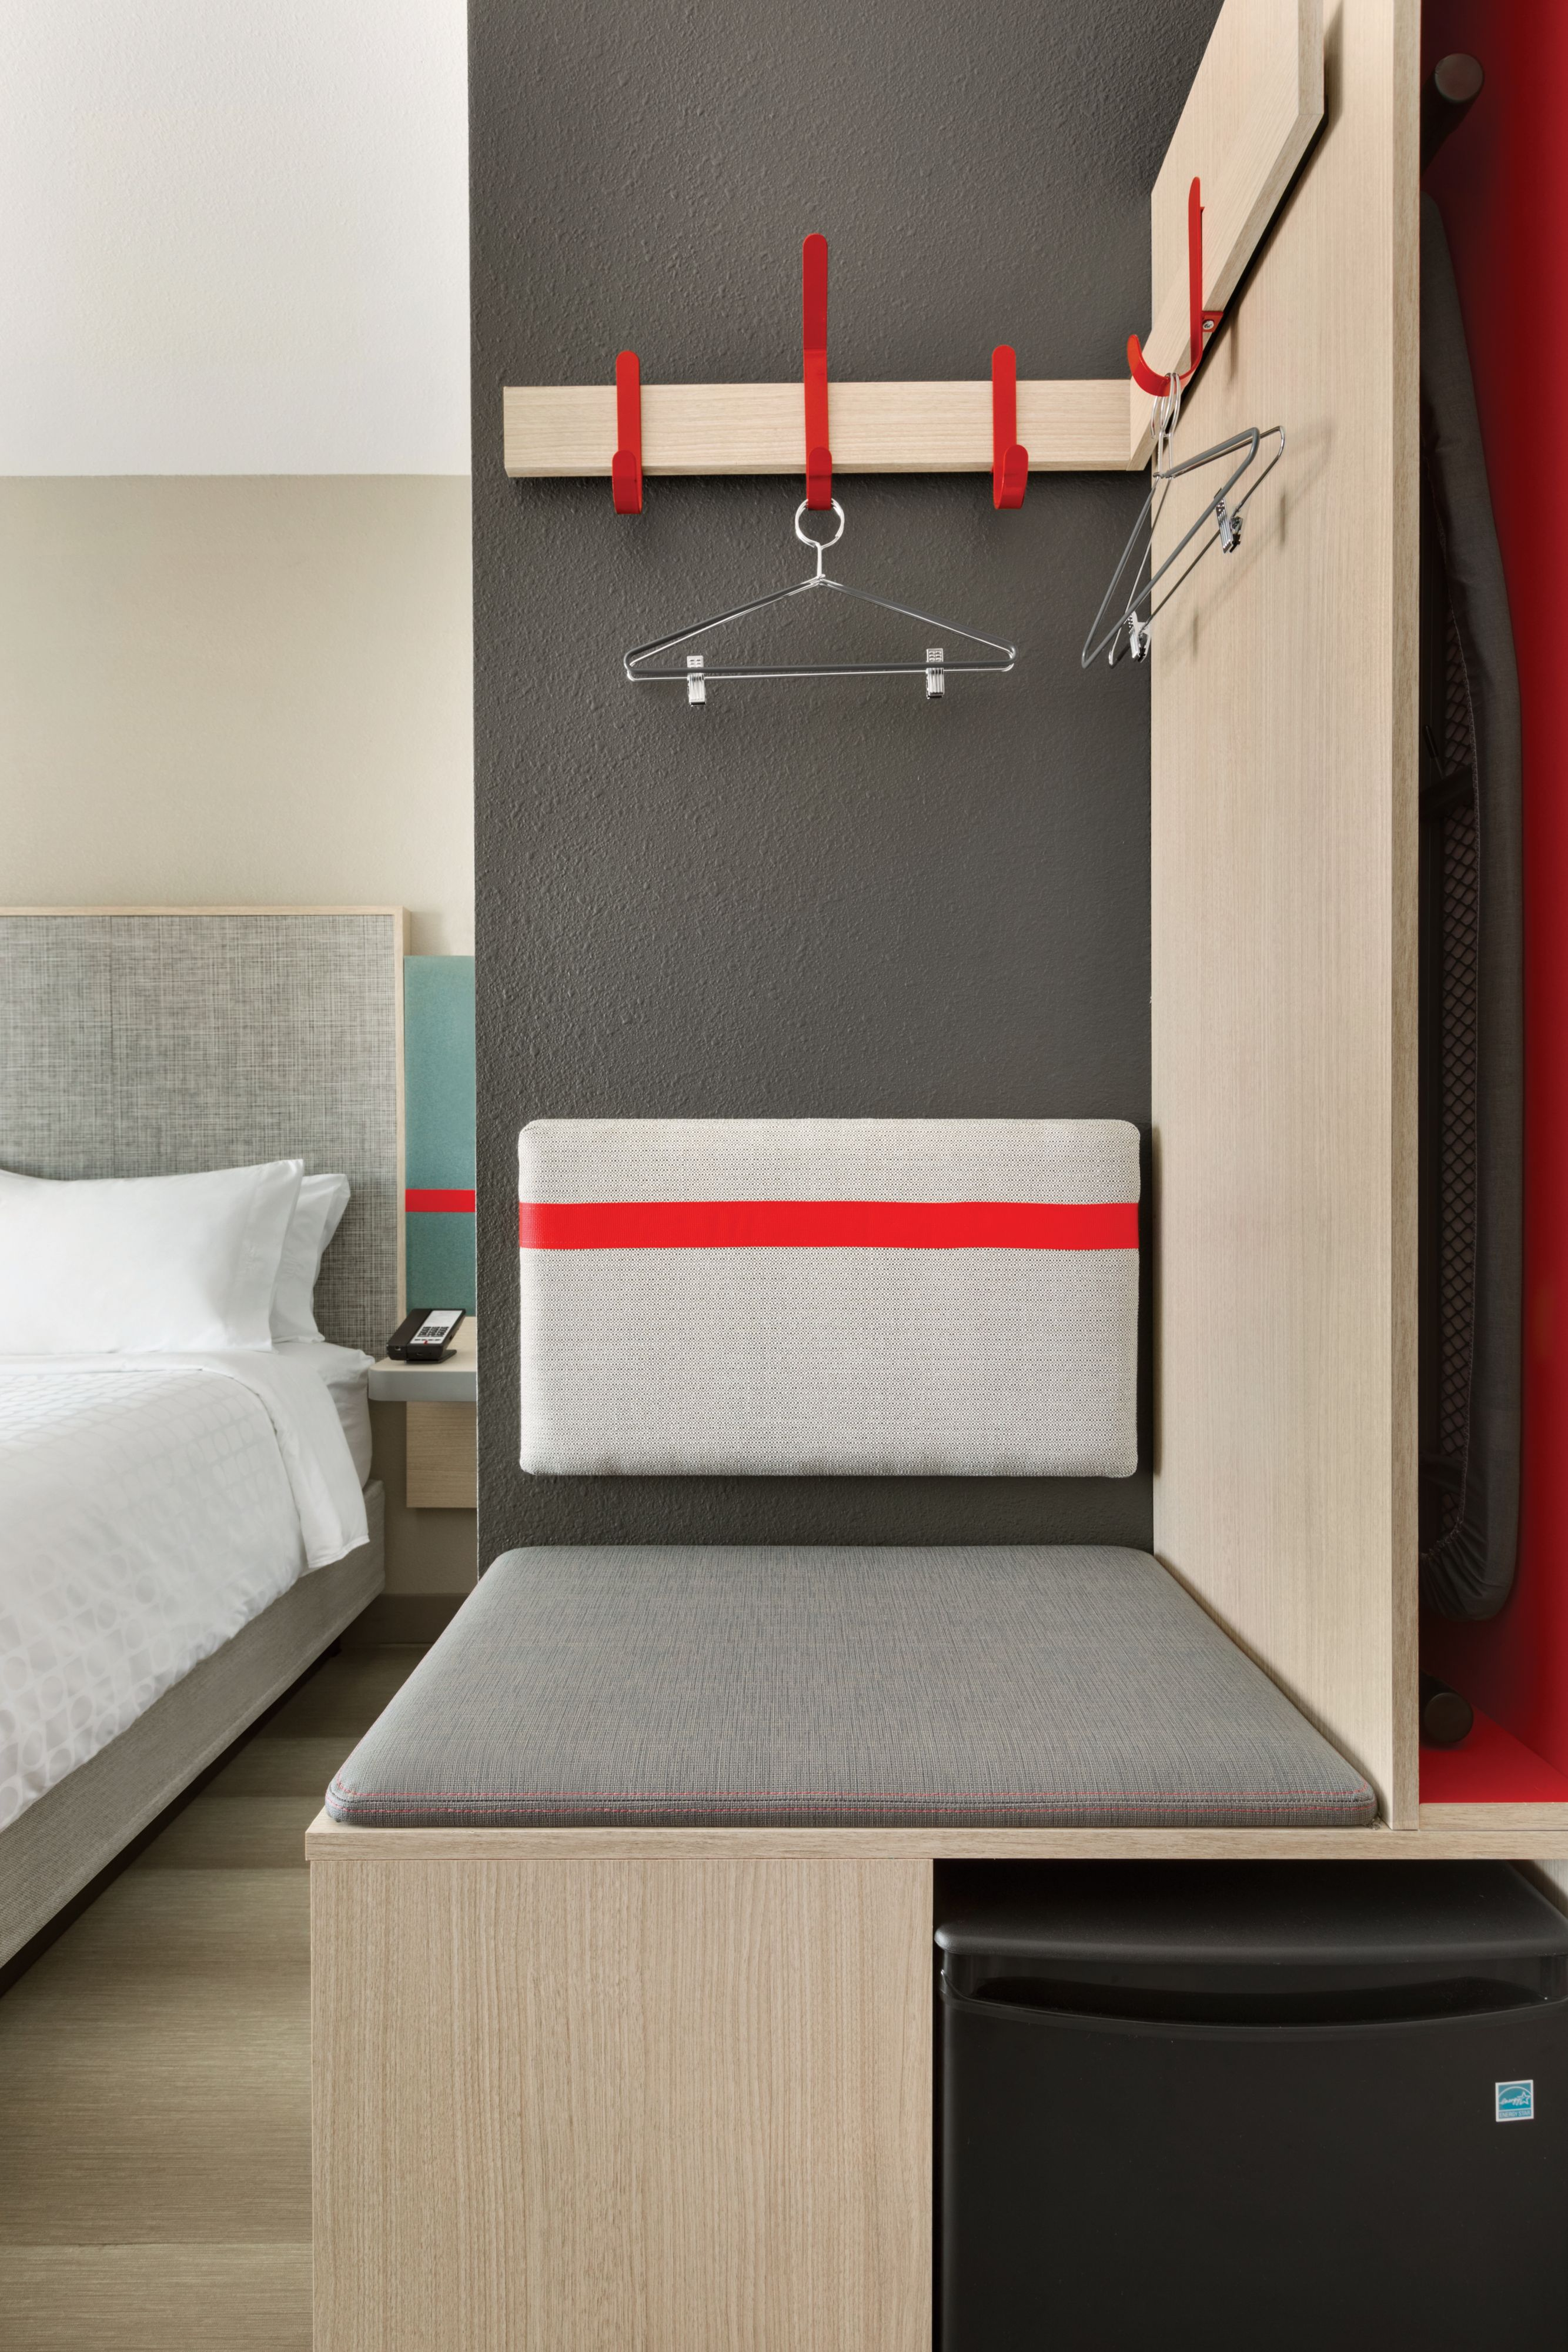 avid hotel Beaumont image 11